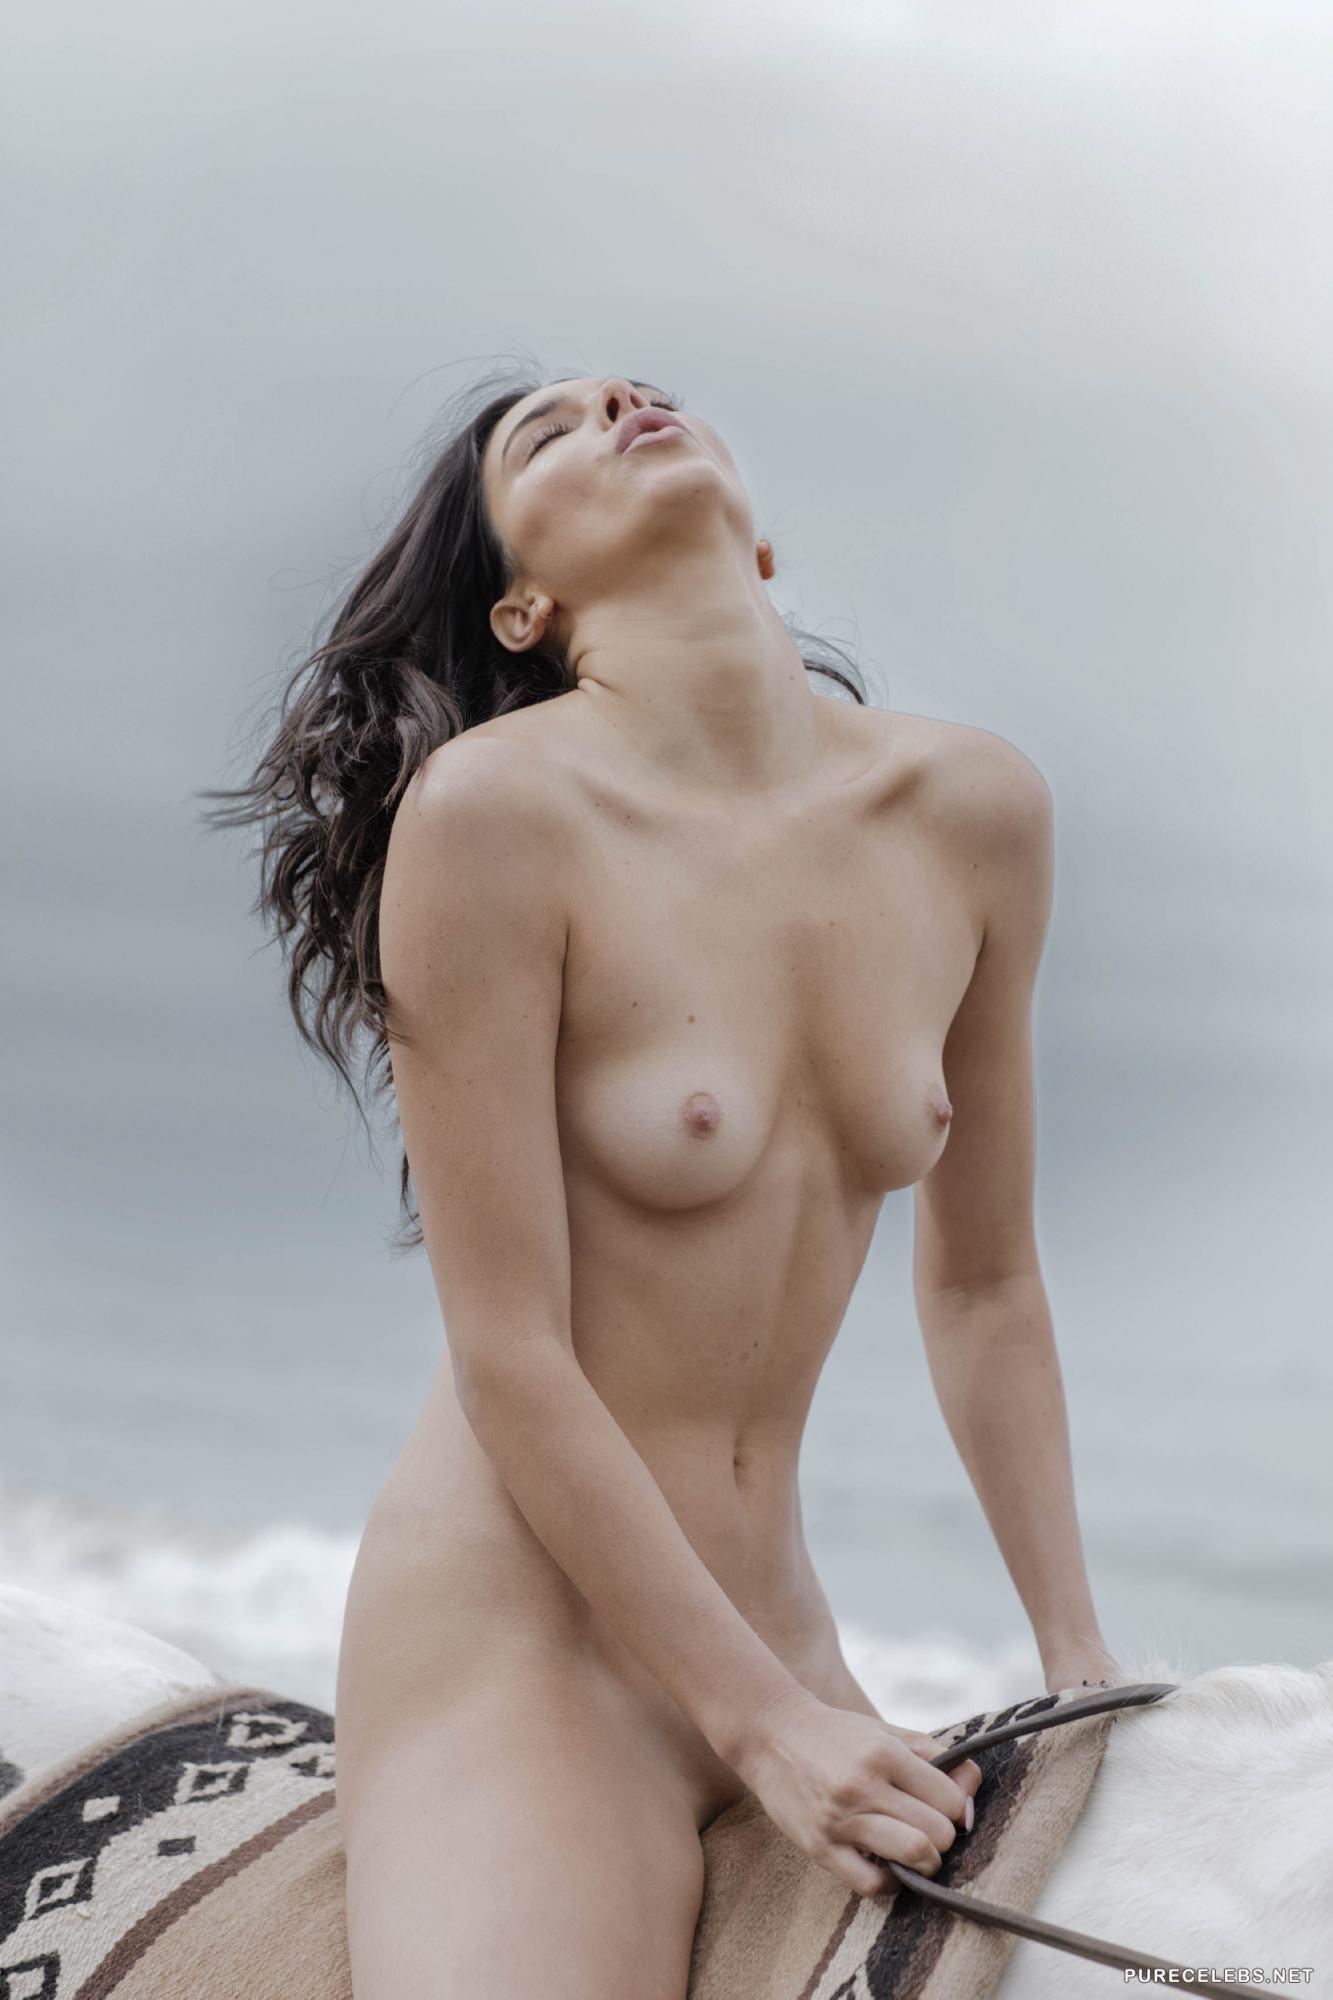 Kendall Jenner Nude Beach Run photo 20